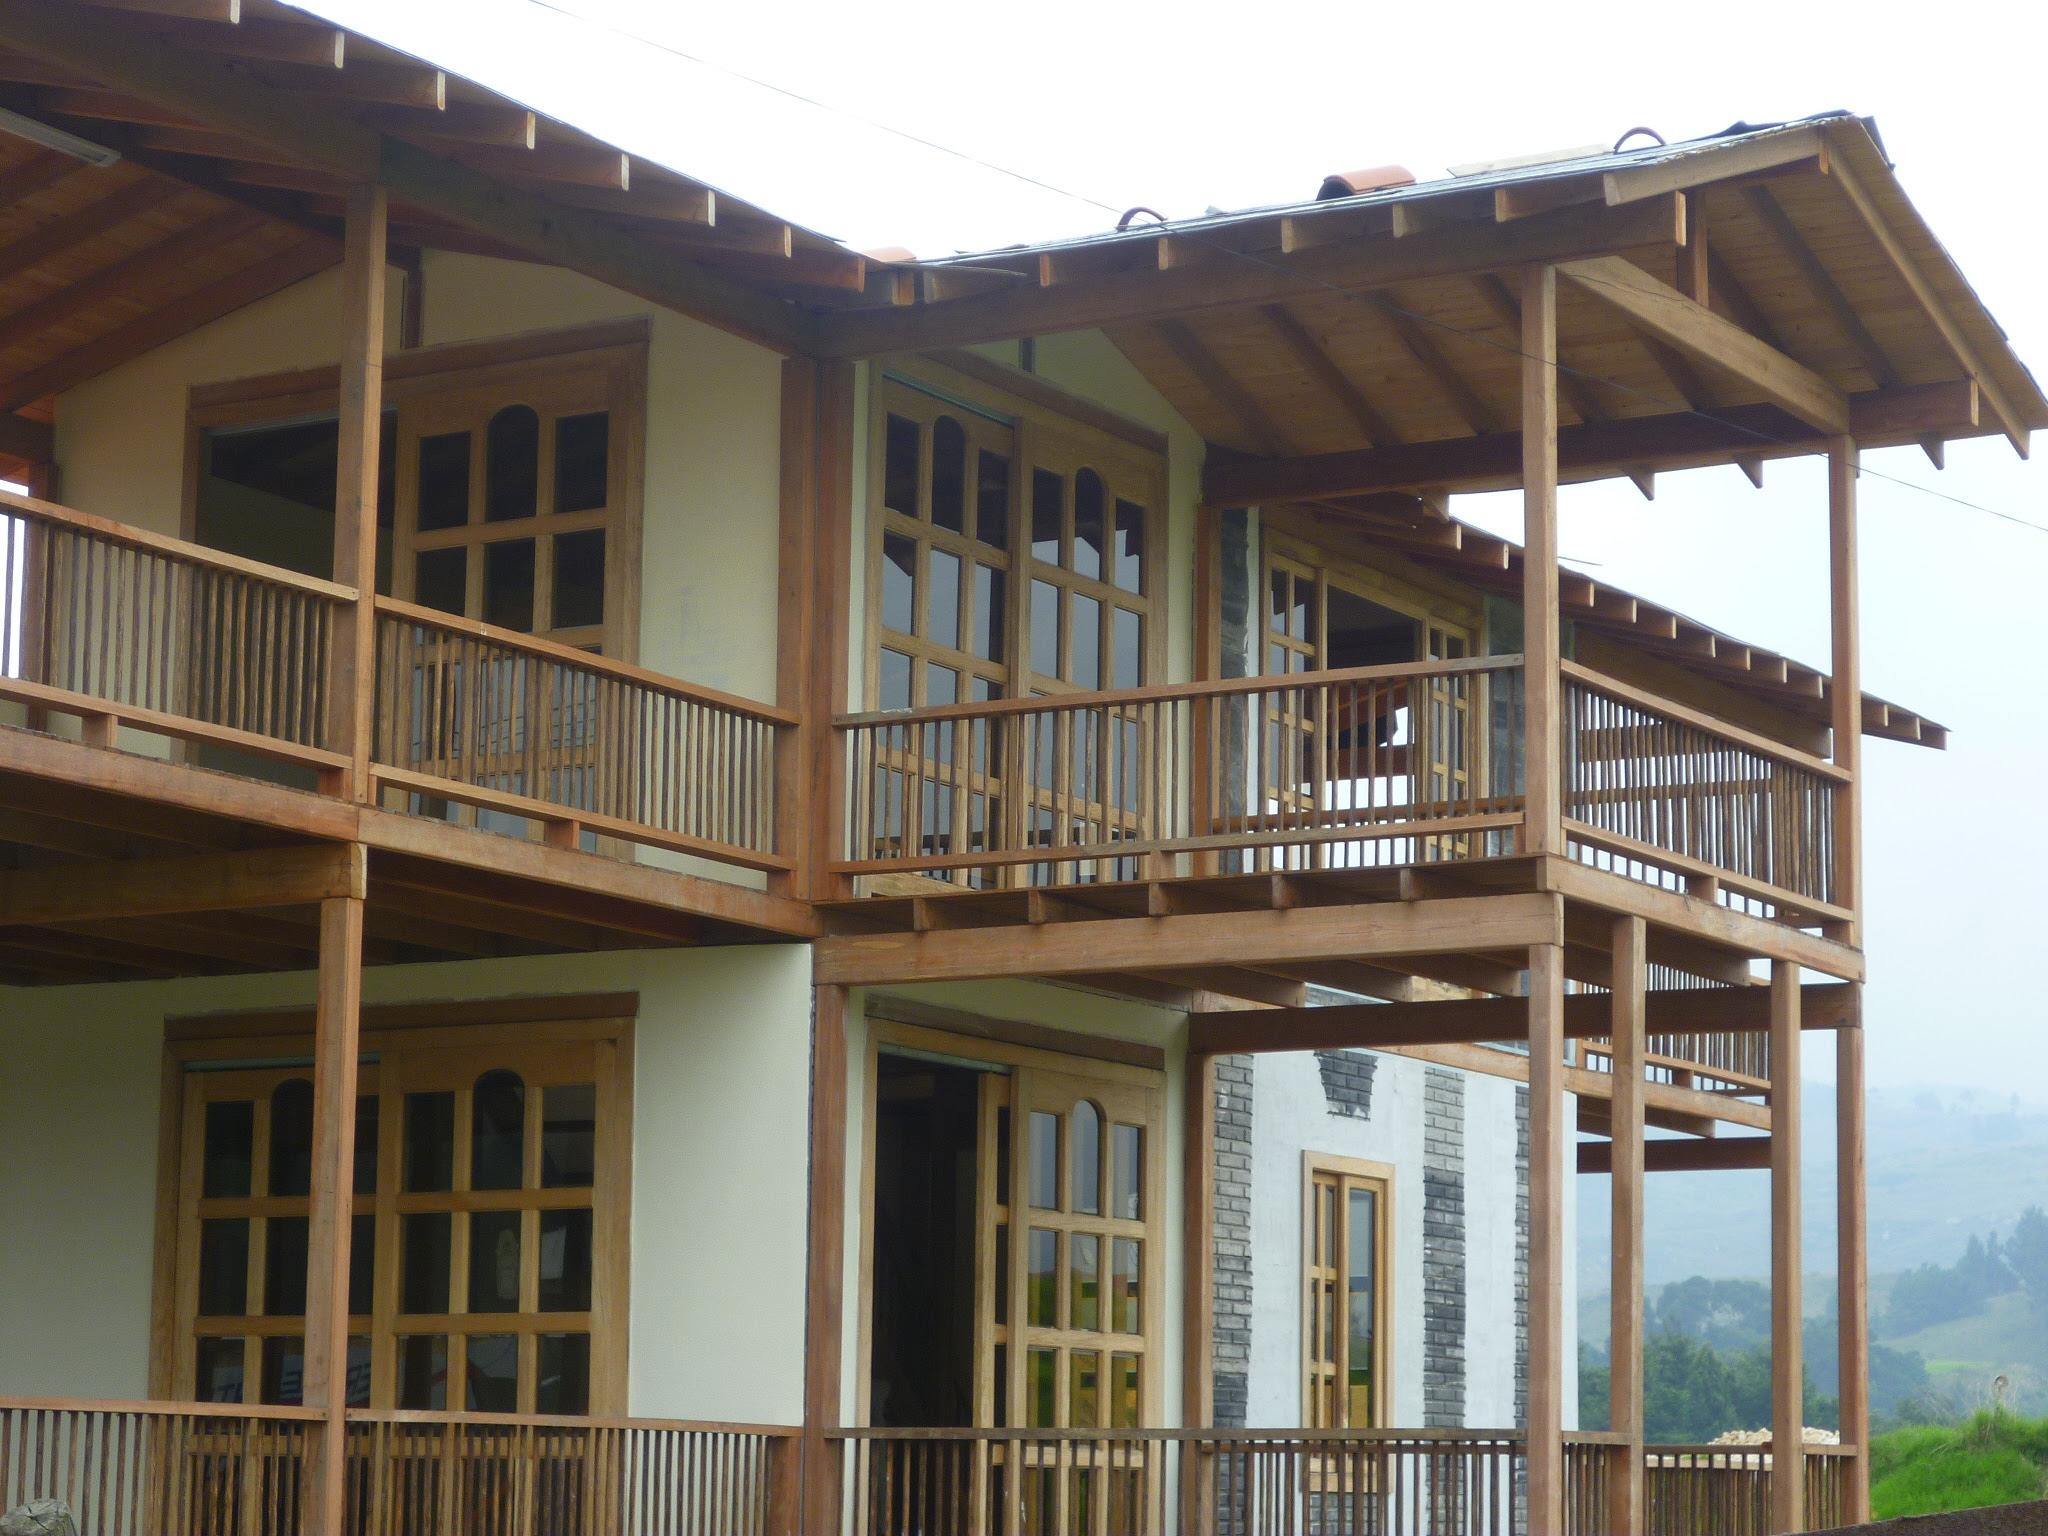 Casas de madera prefabricadas casas prefabricadas boyaca - Opiniones casas prefabricadas ...